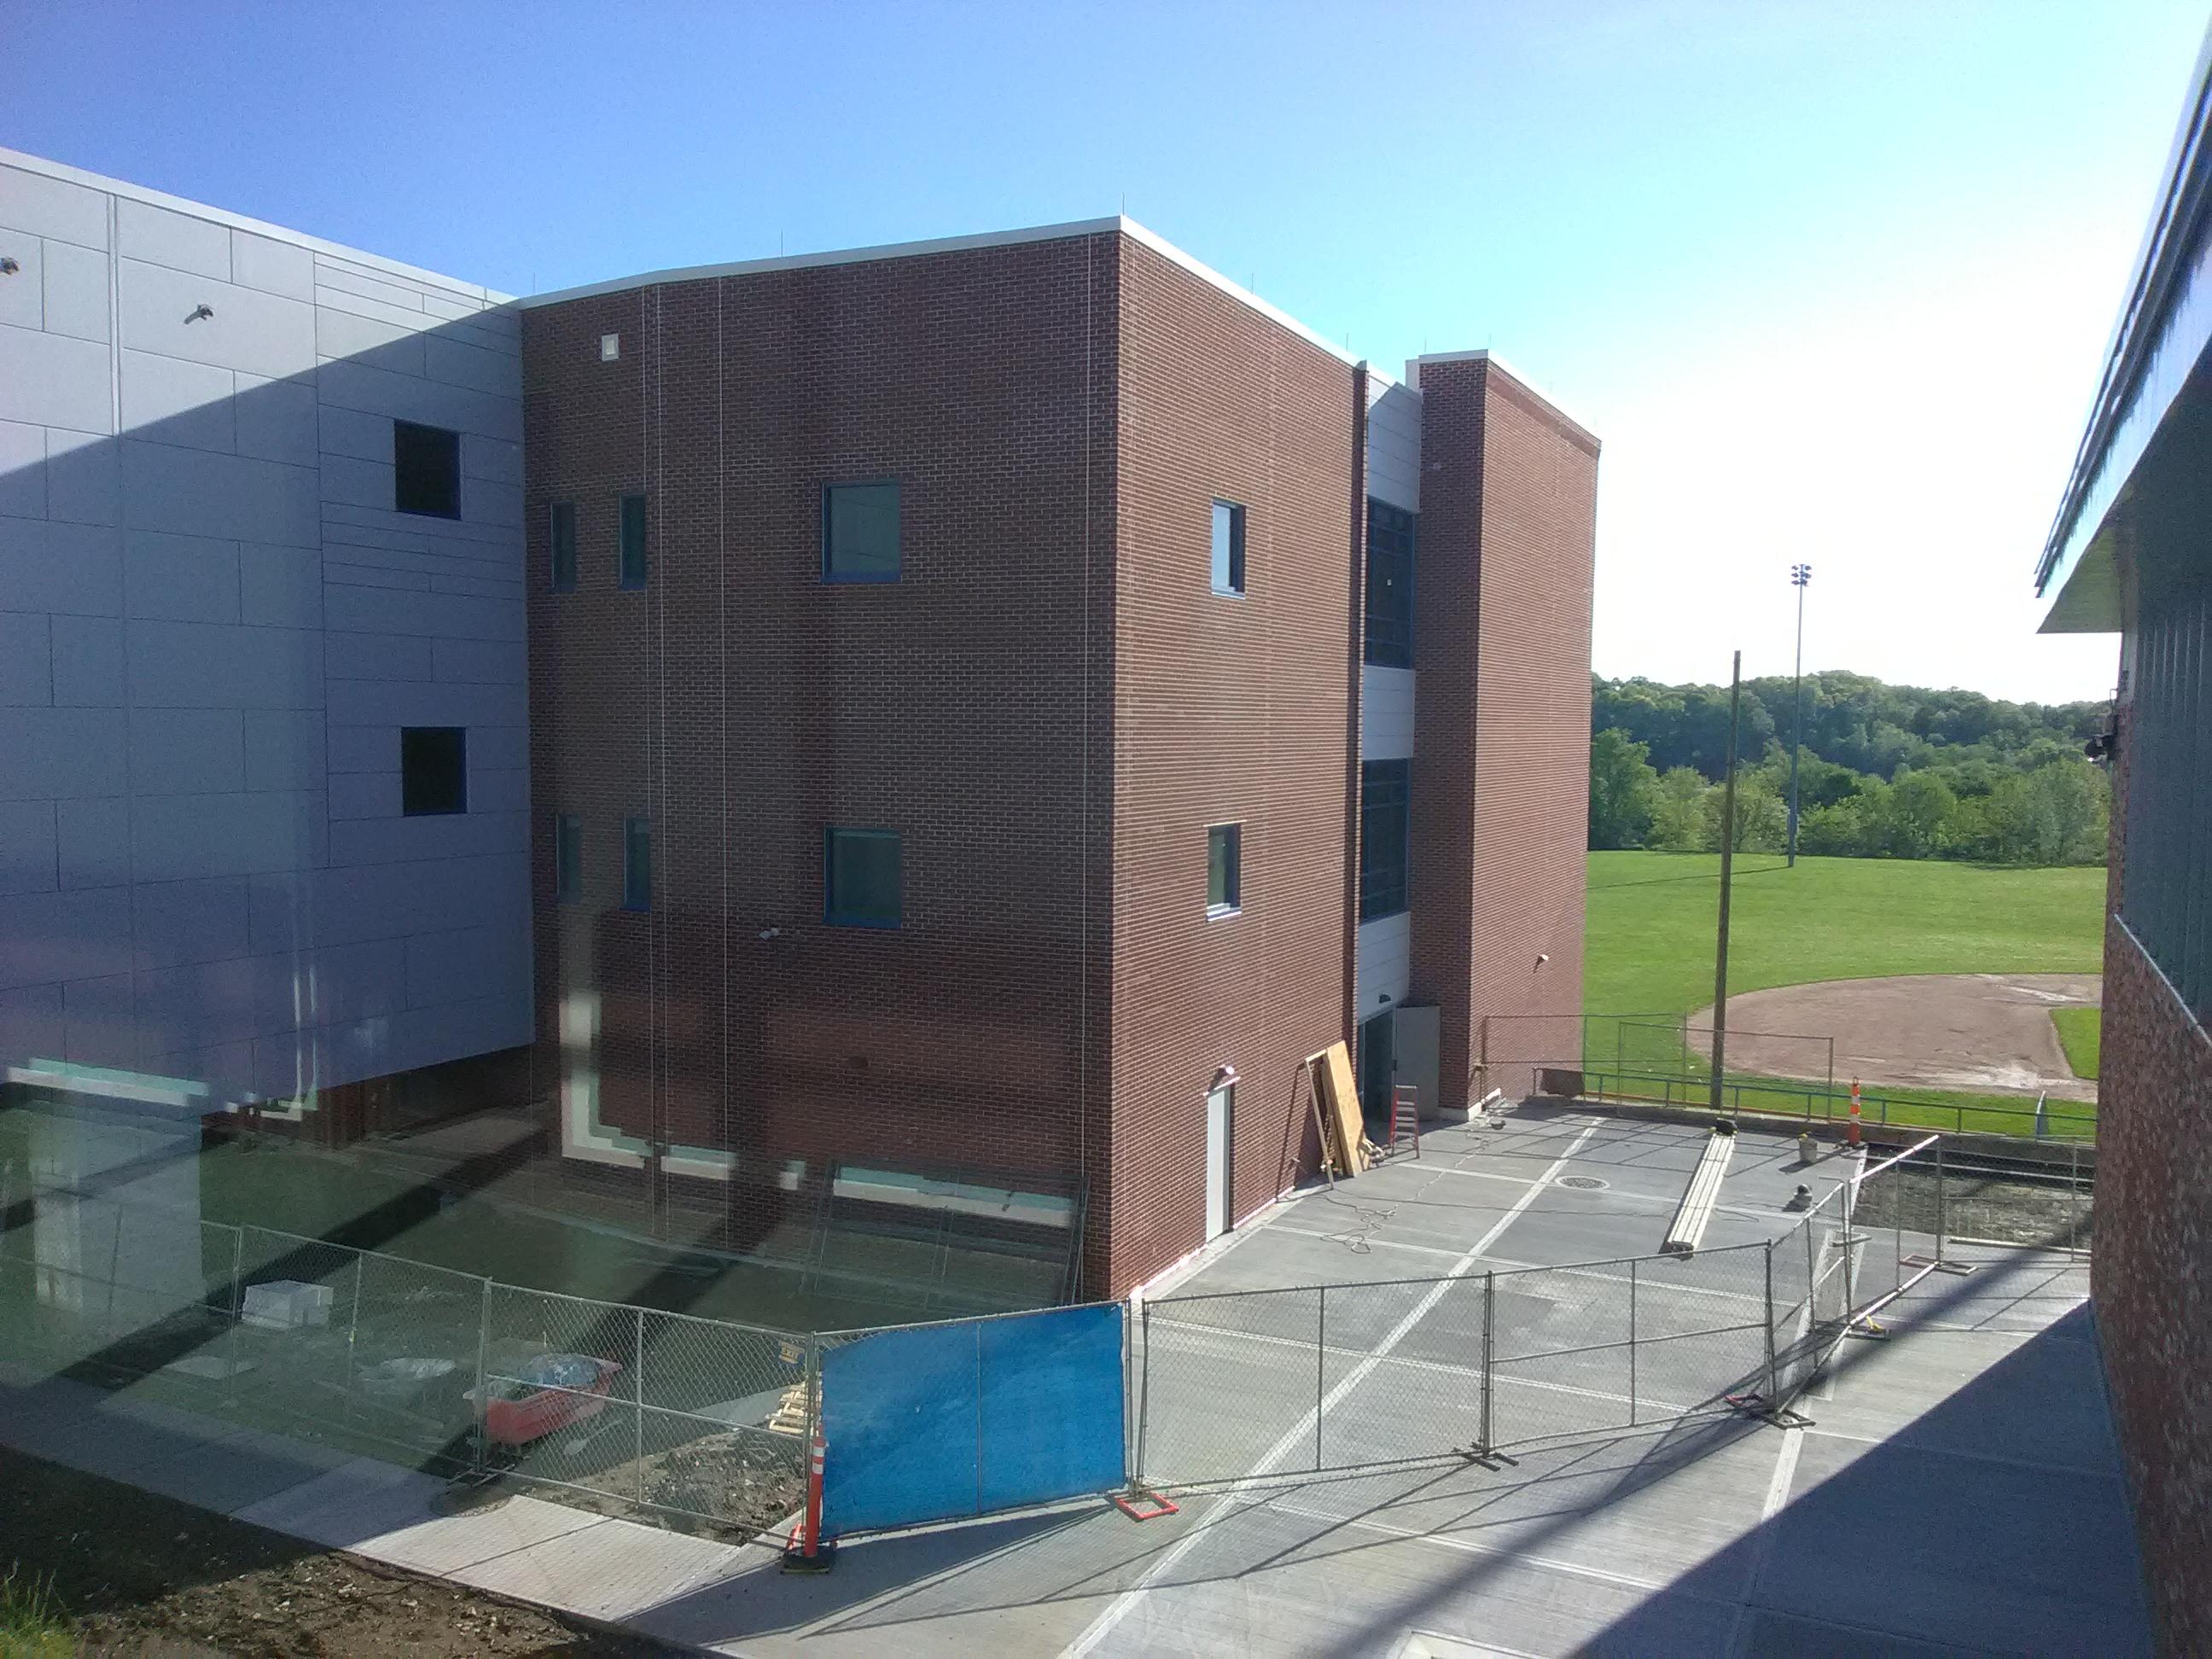 File:Danbury High School G building jpg - Wikimedia Commons